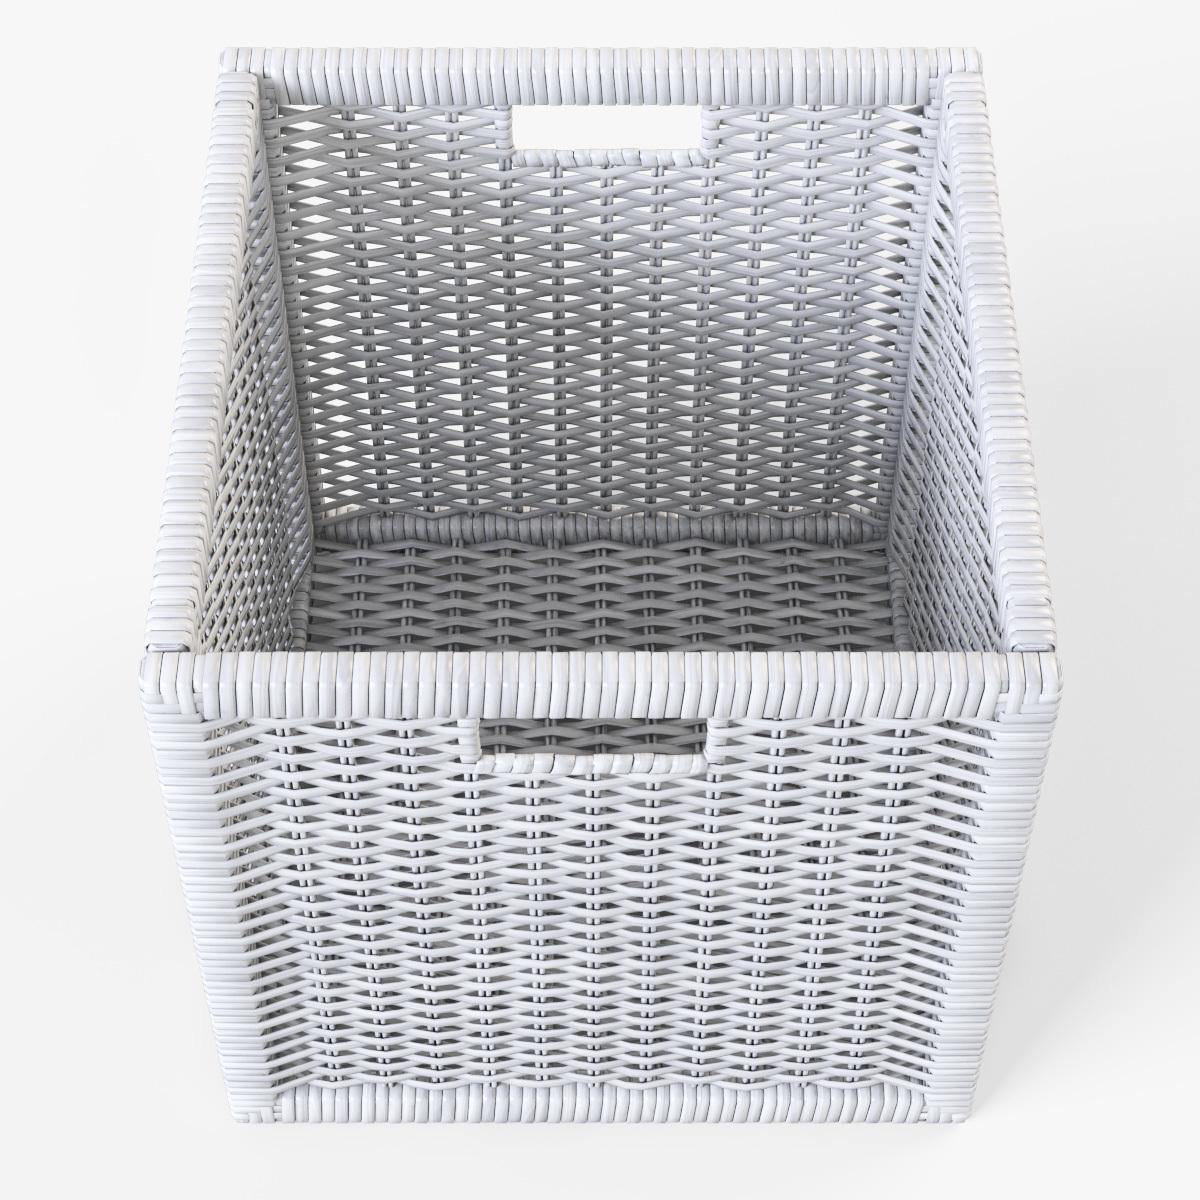 Rattan Basket Ikea Branas White Color By Markelos 3docean